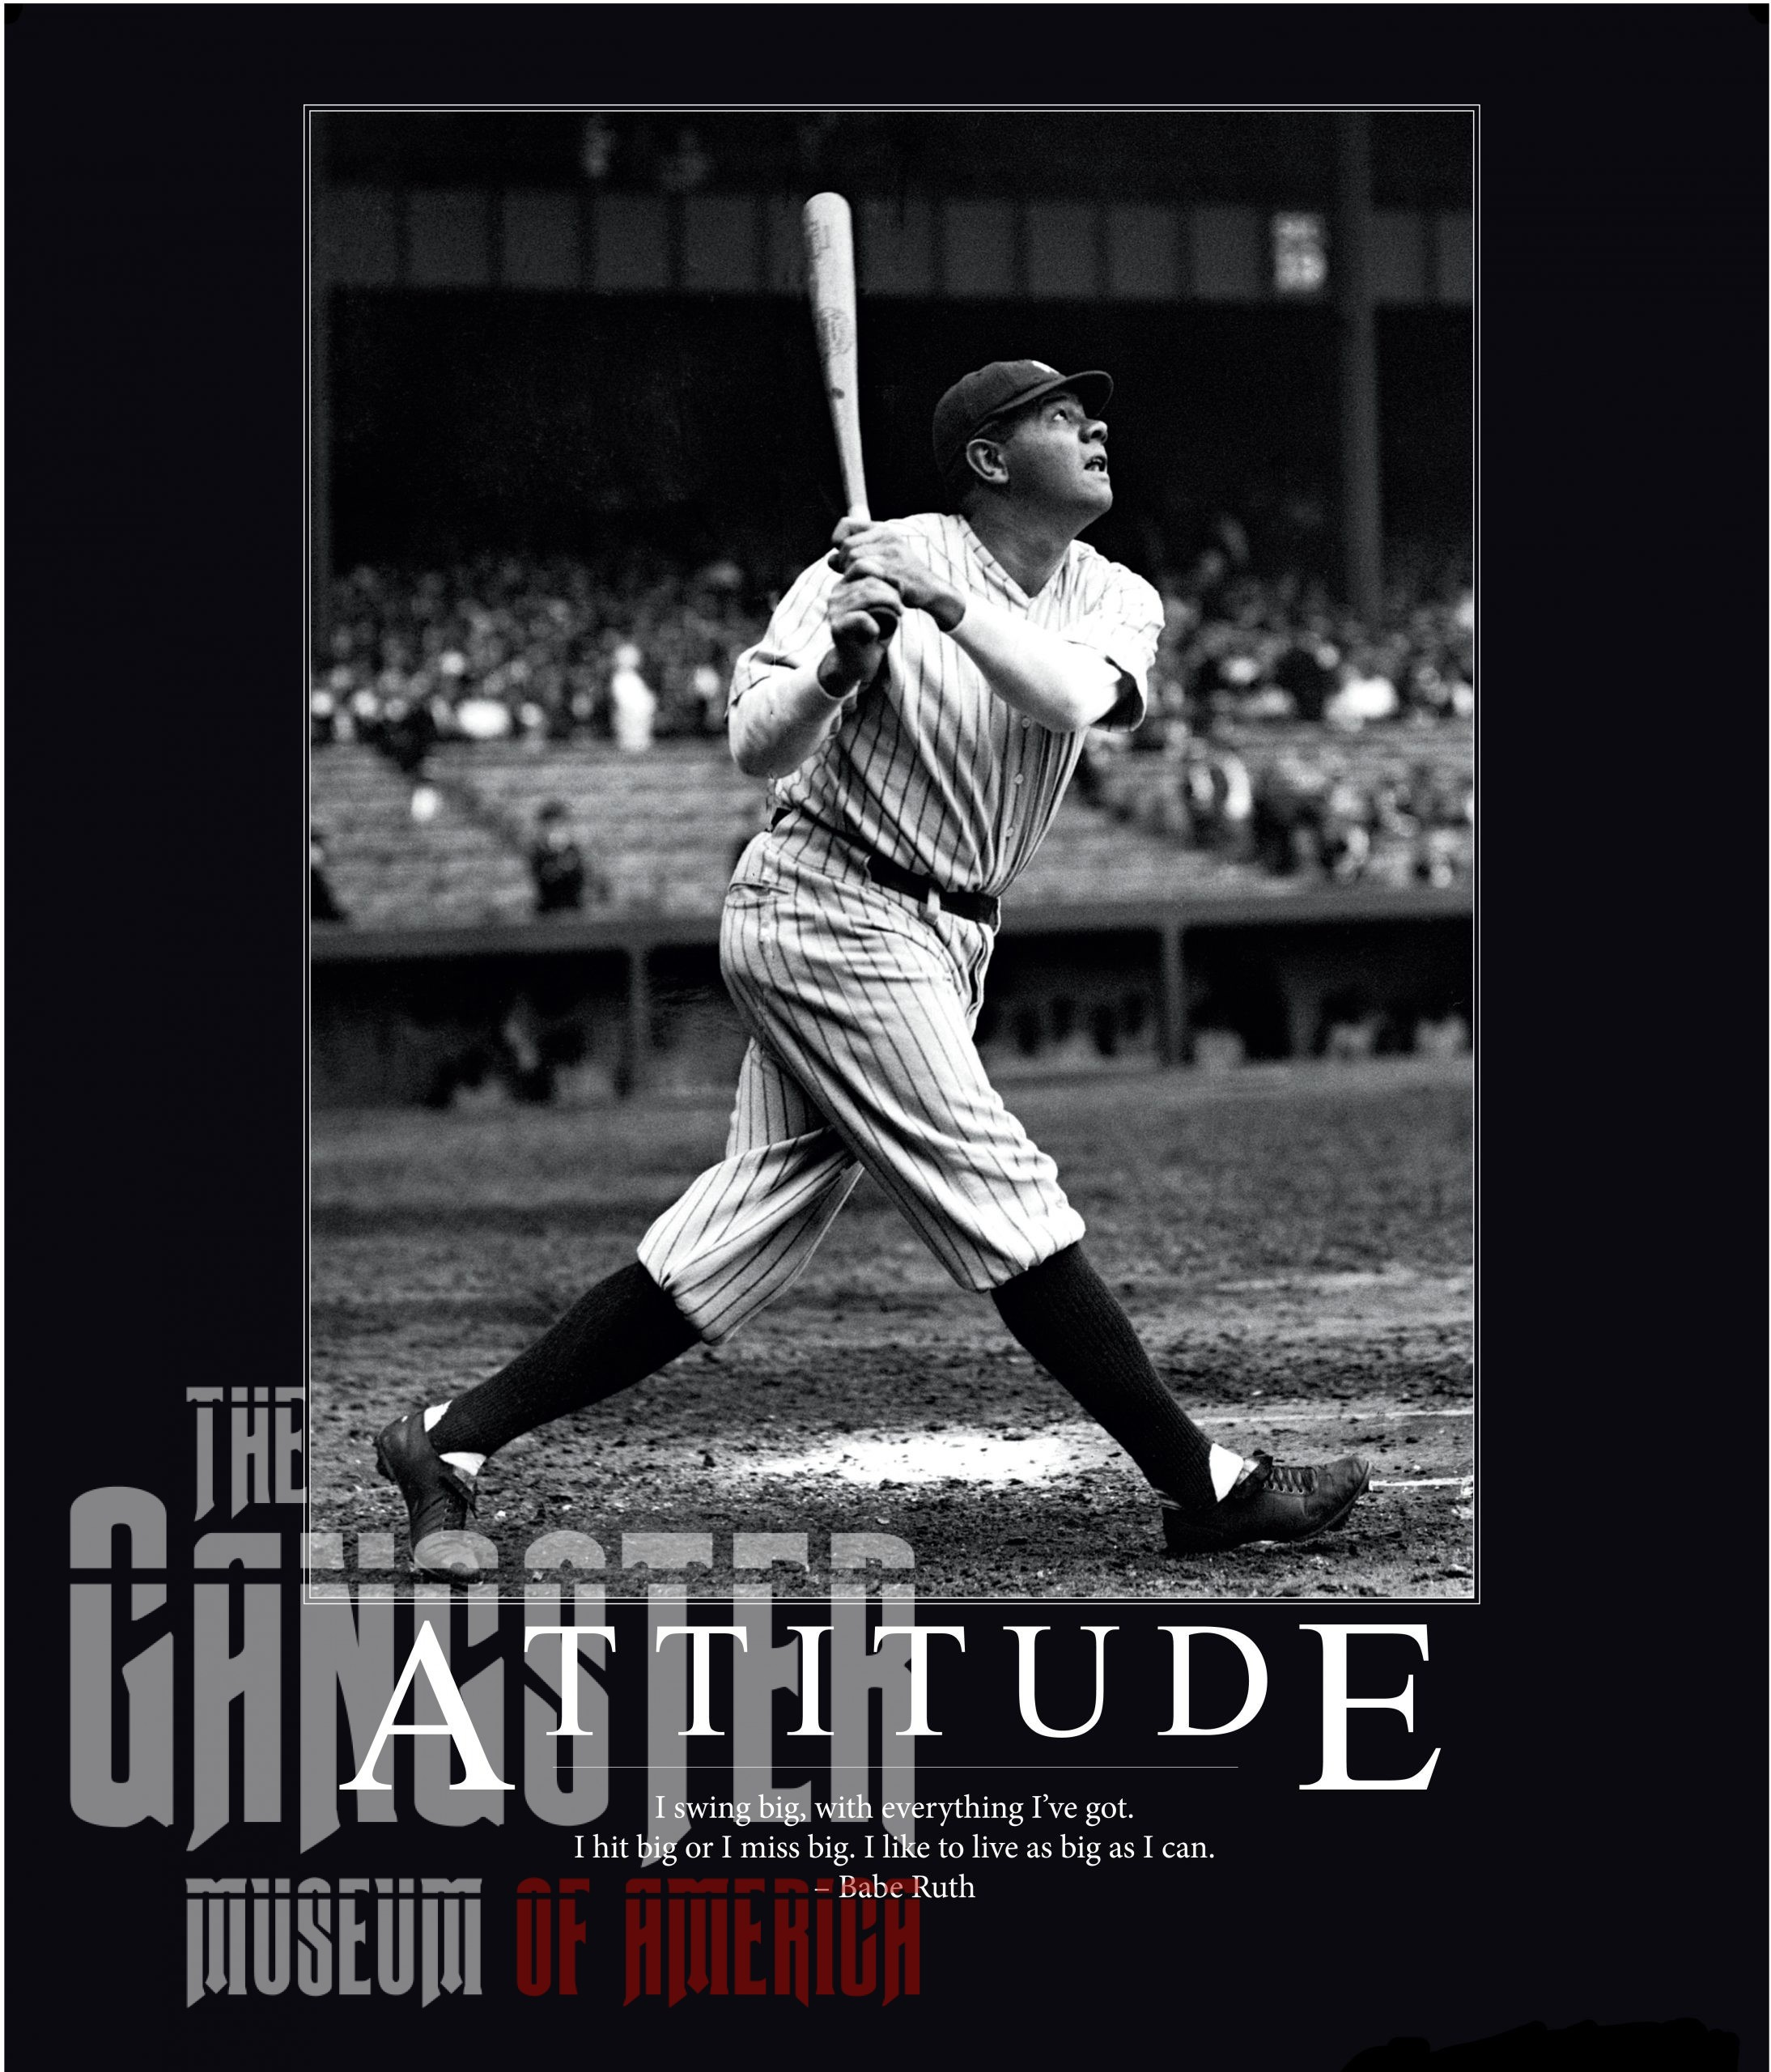 Babe Ruth Inspirational Poster - Attitude